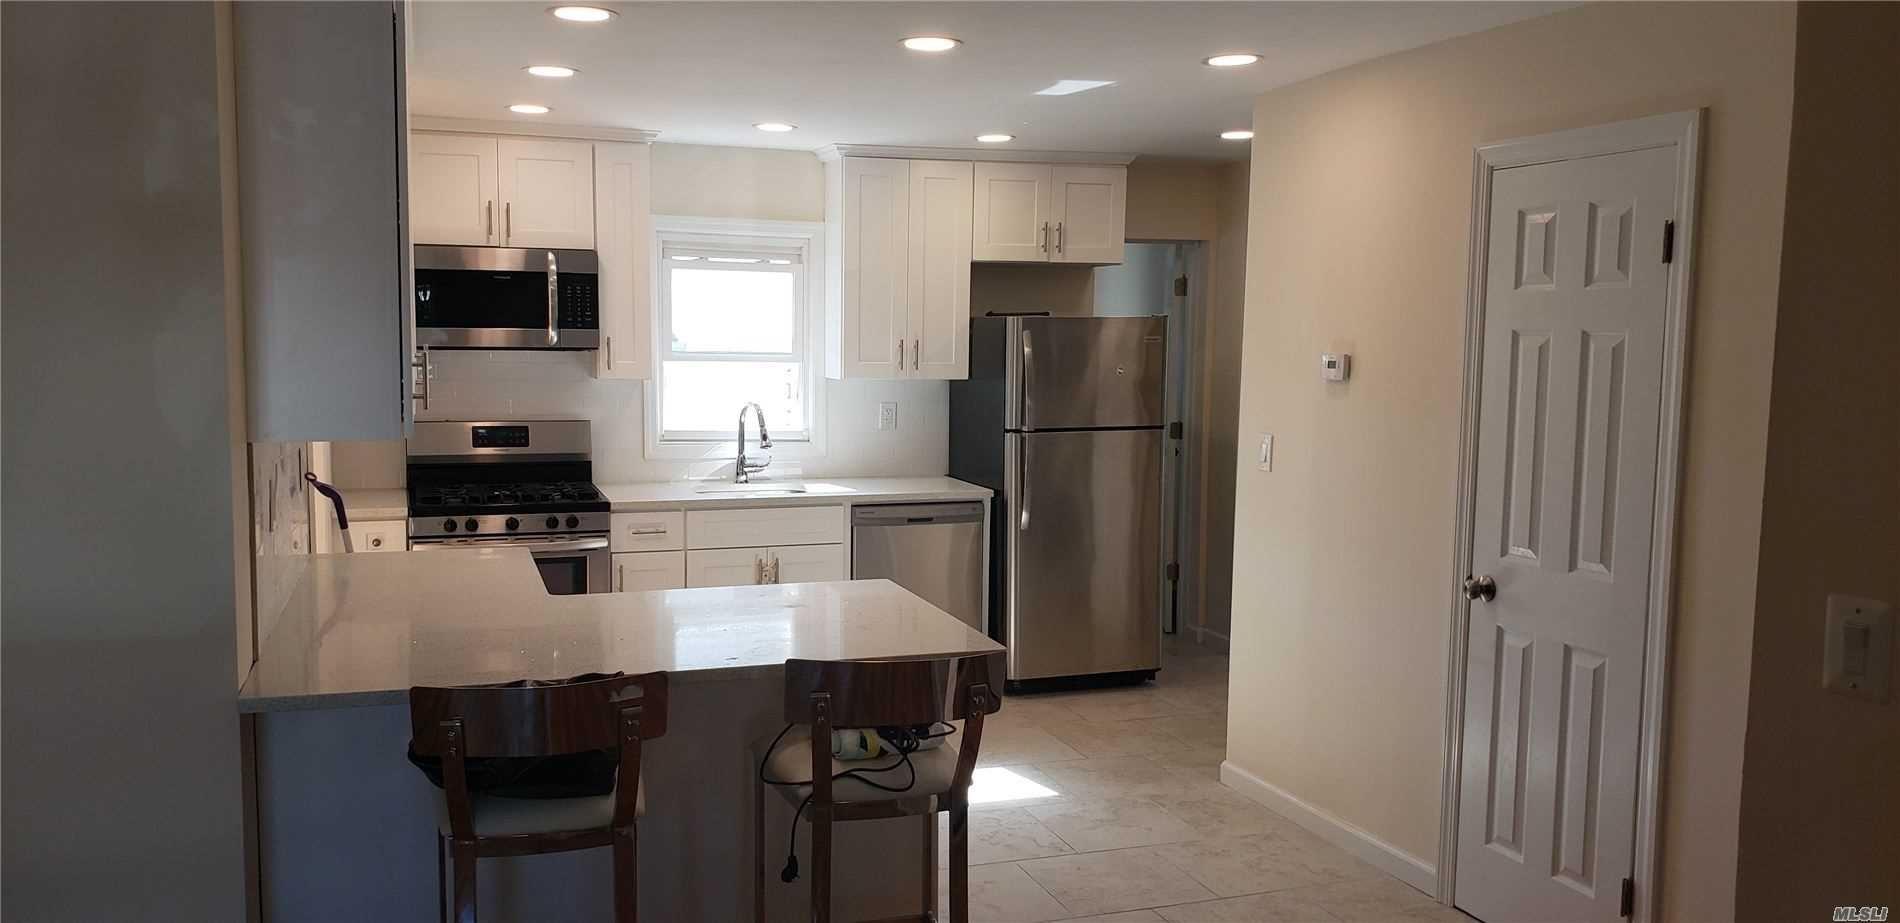 4 S Kensington Avenue, Rockville Centre, NY 11570 - MLS#: 3235040